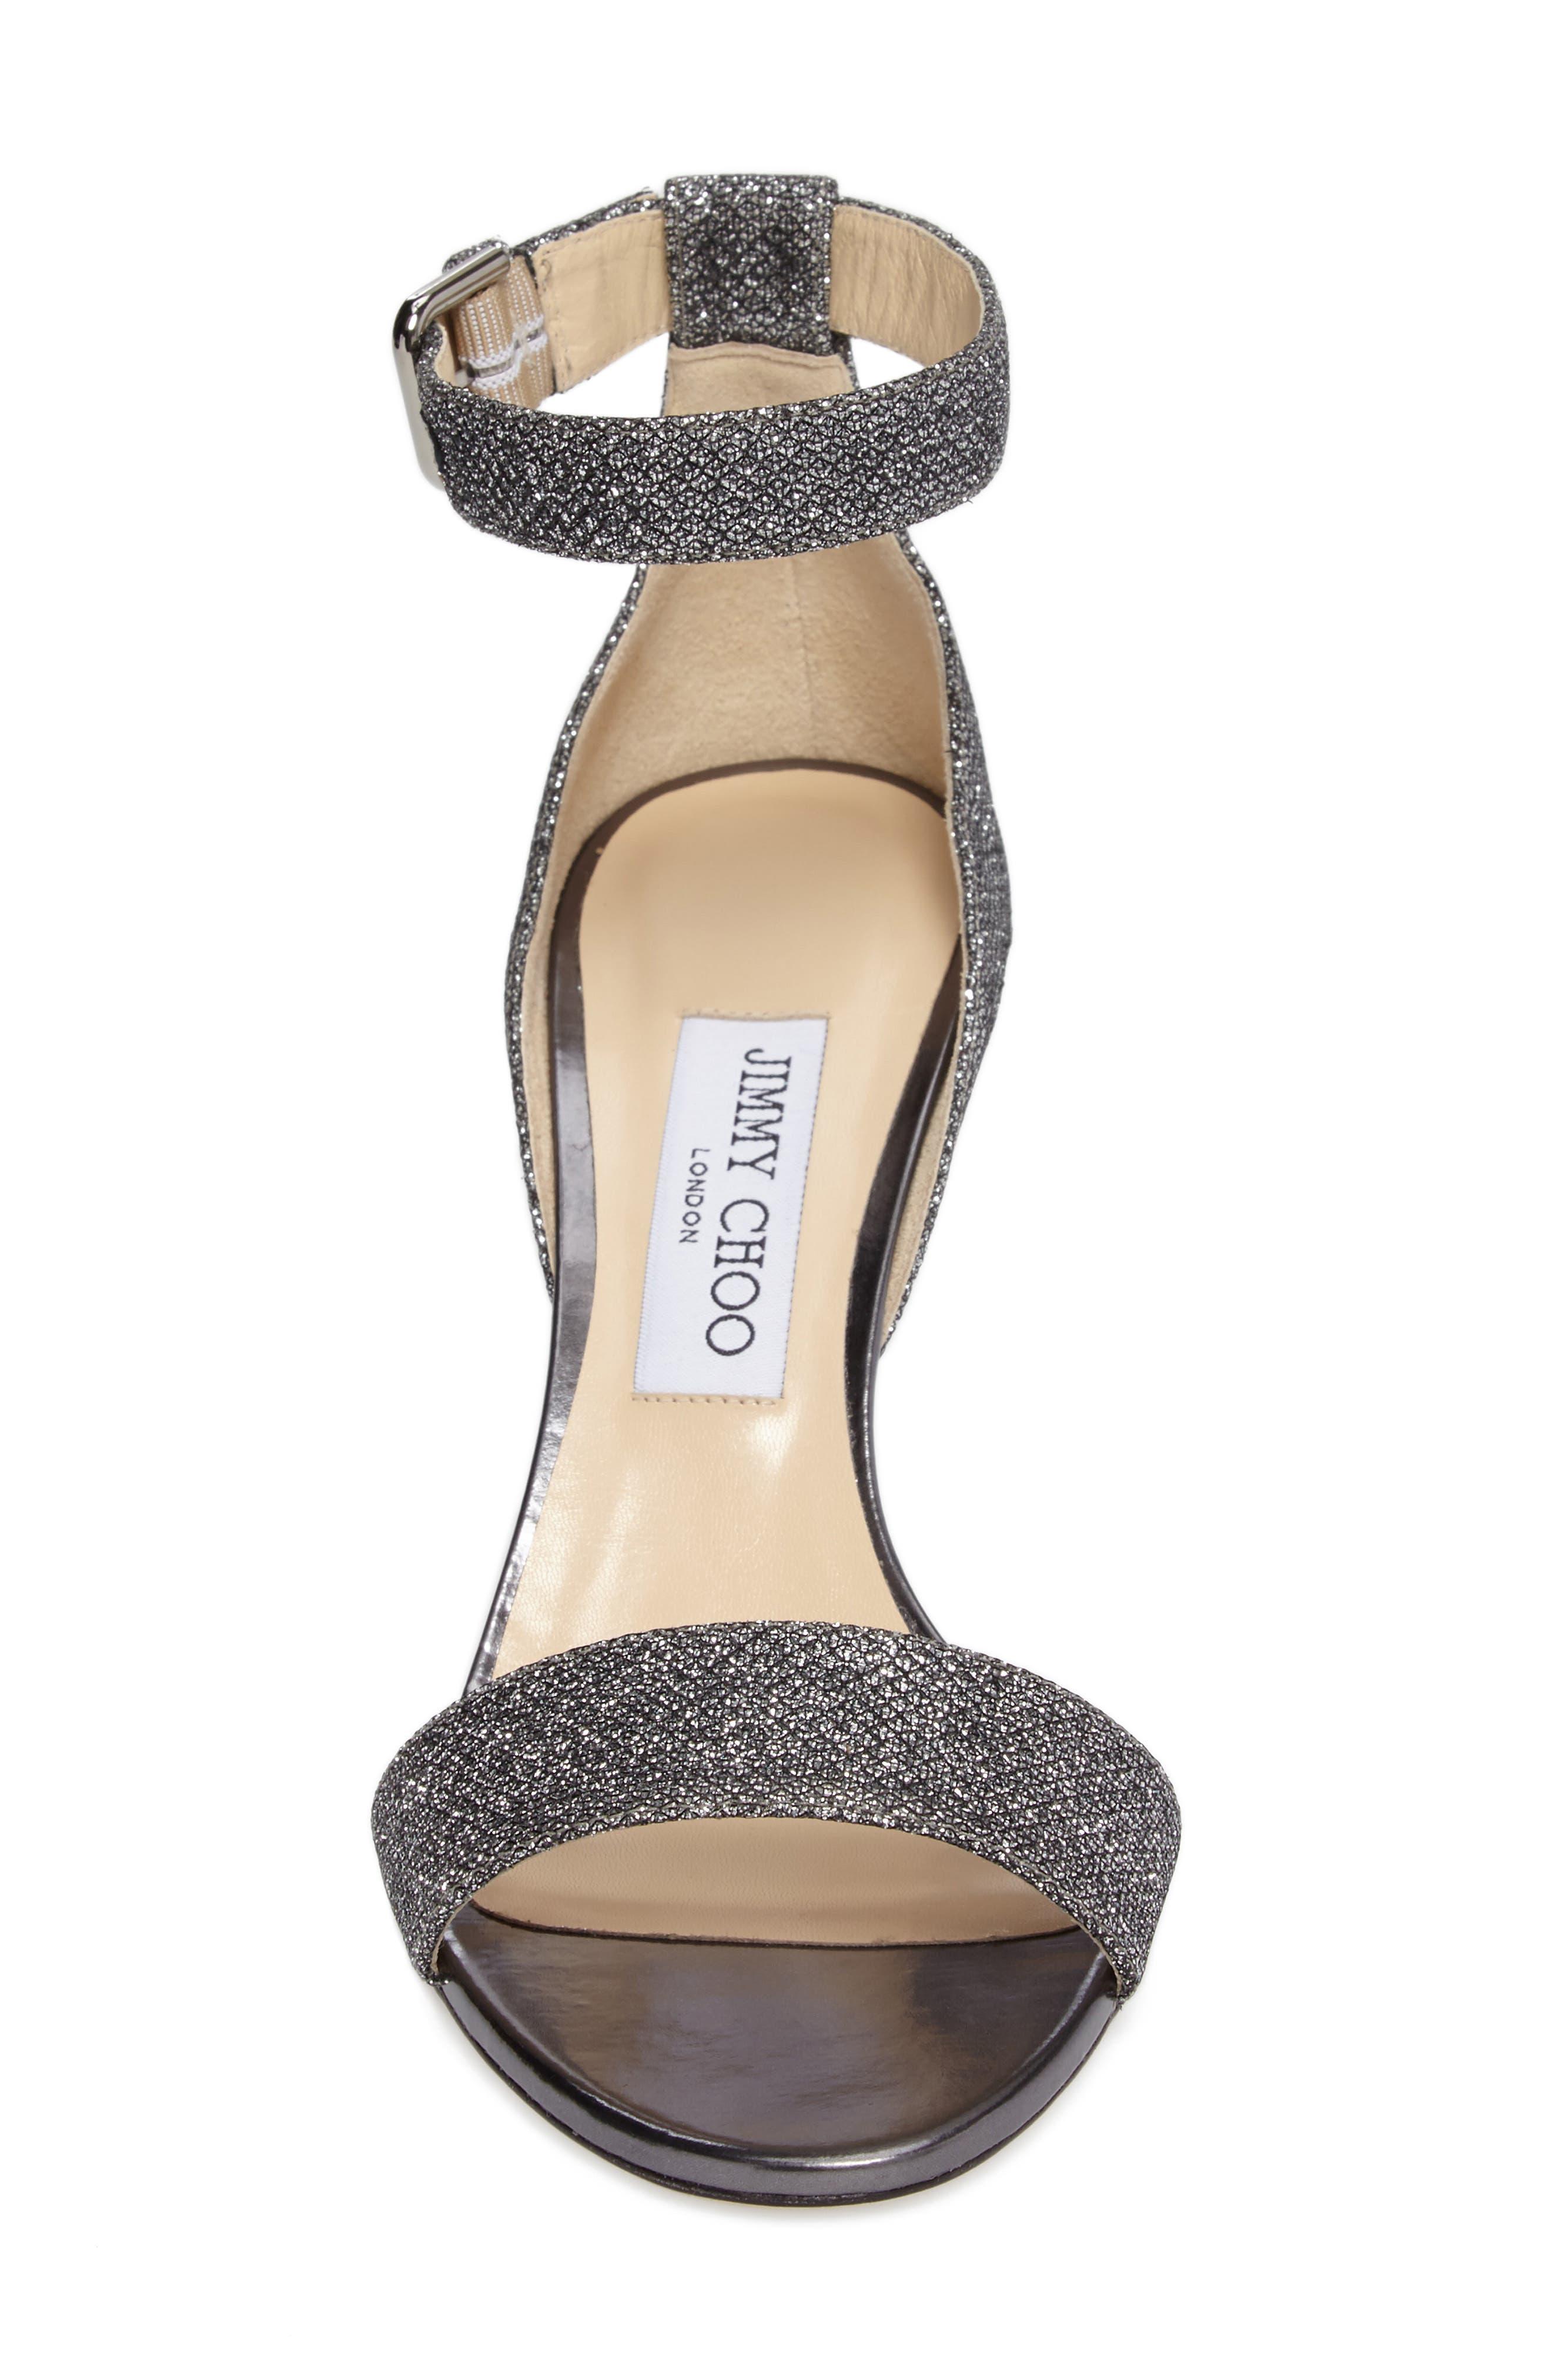 Edina Ankle Strap Sandal,                             Alternate thumbnail 4, color,                             Anthracite